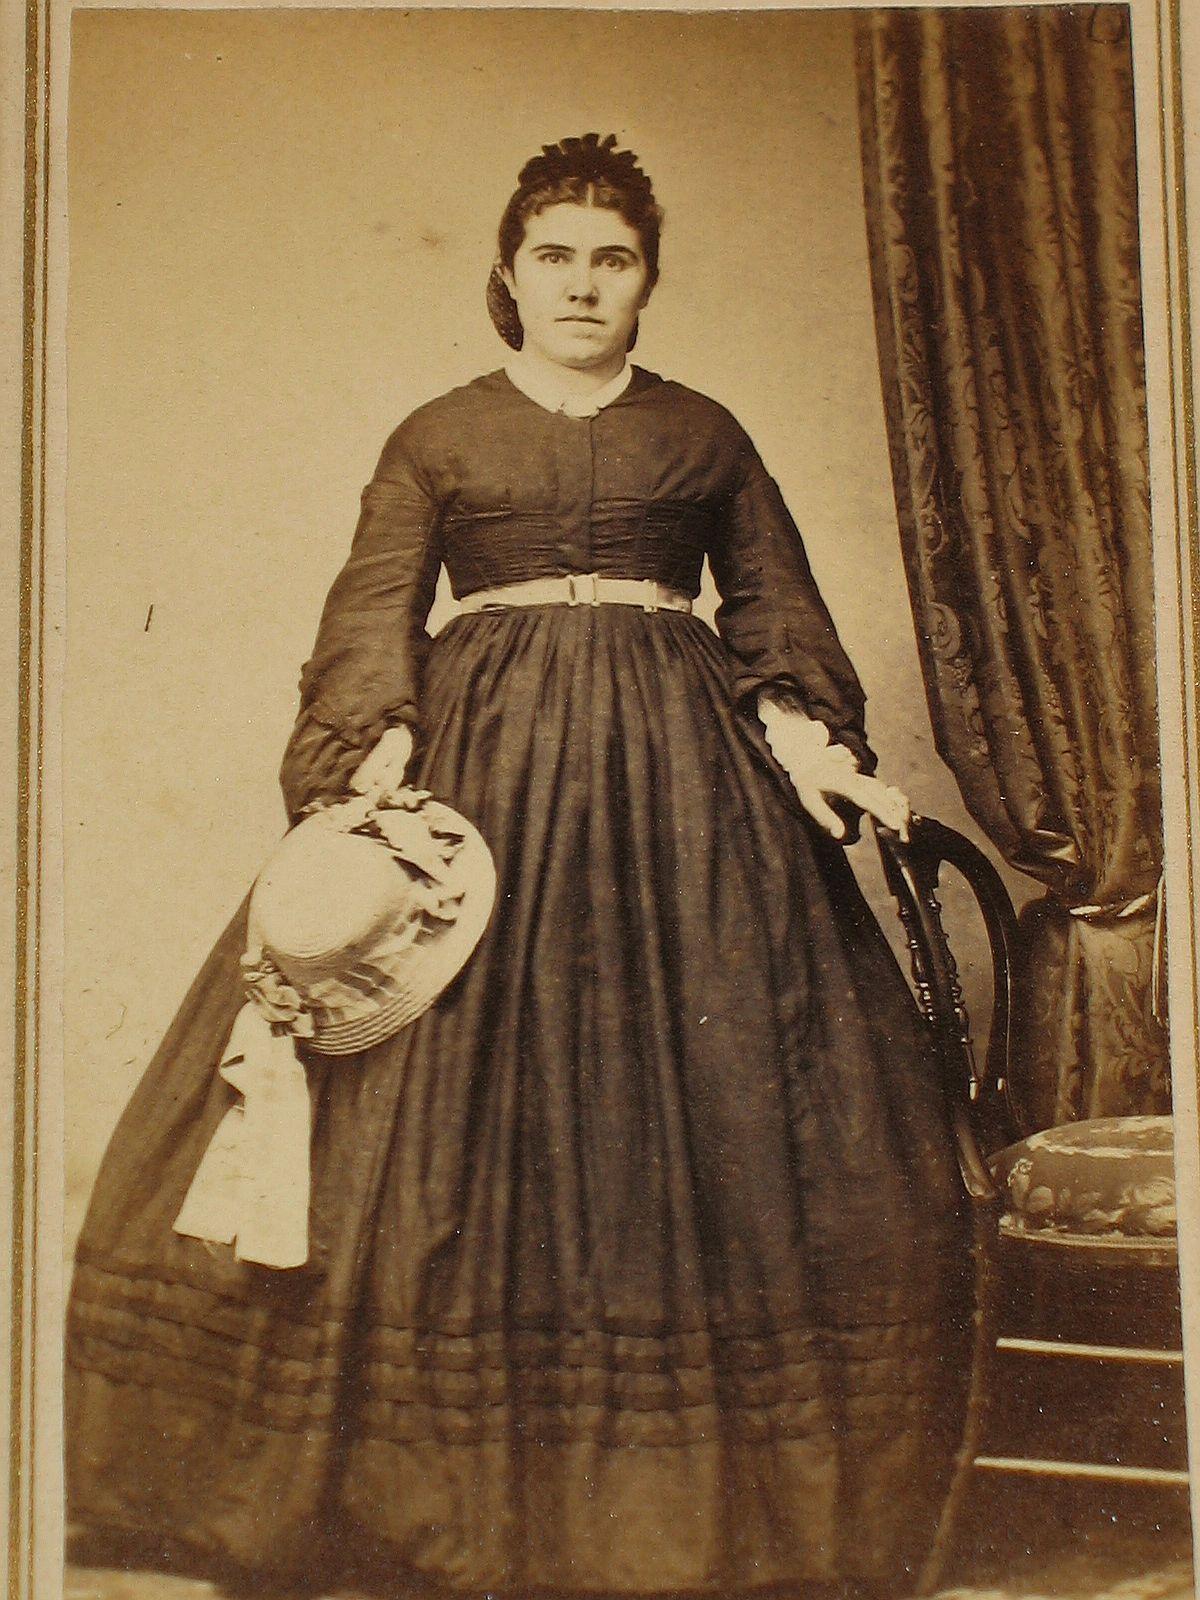 CDV Civil War Era Woman Victorian Dress Bonnet Alliance ...